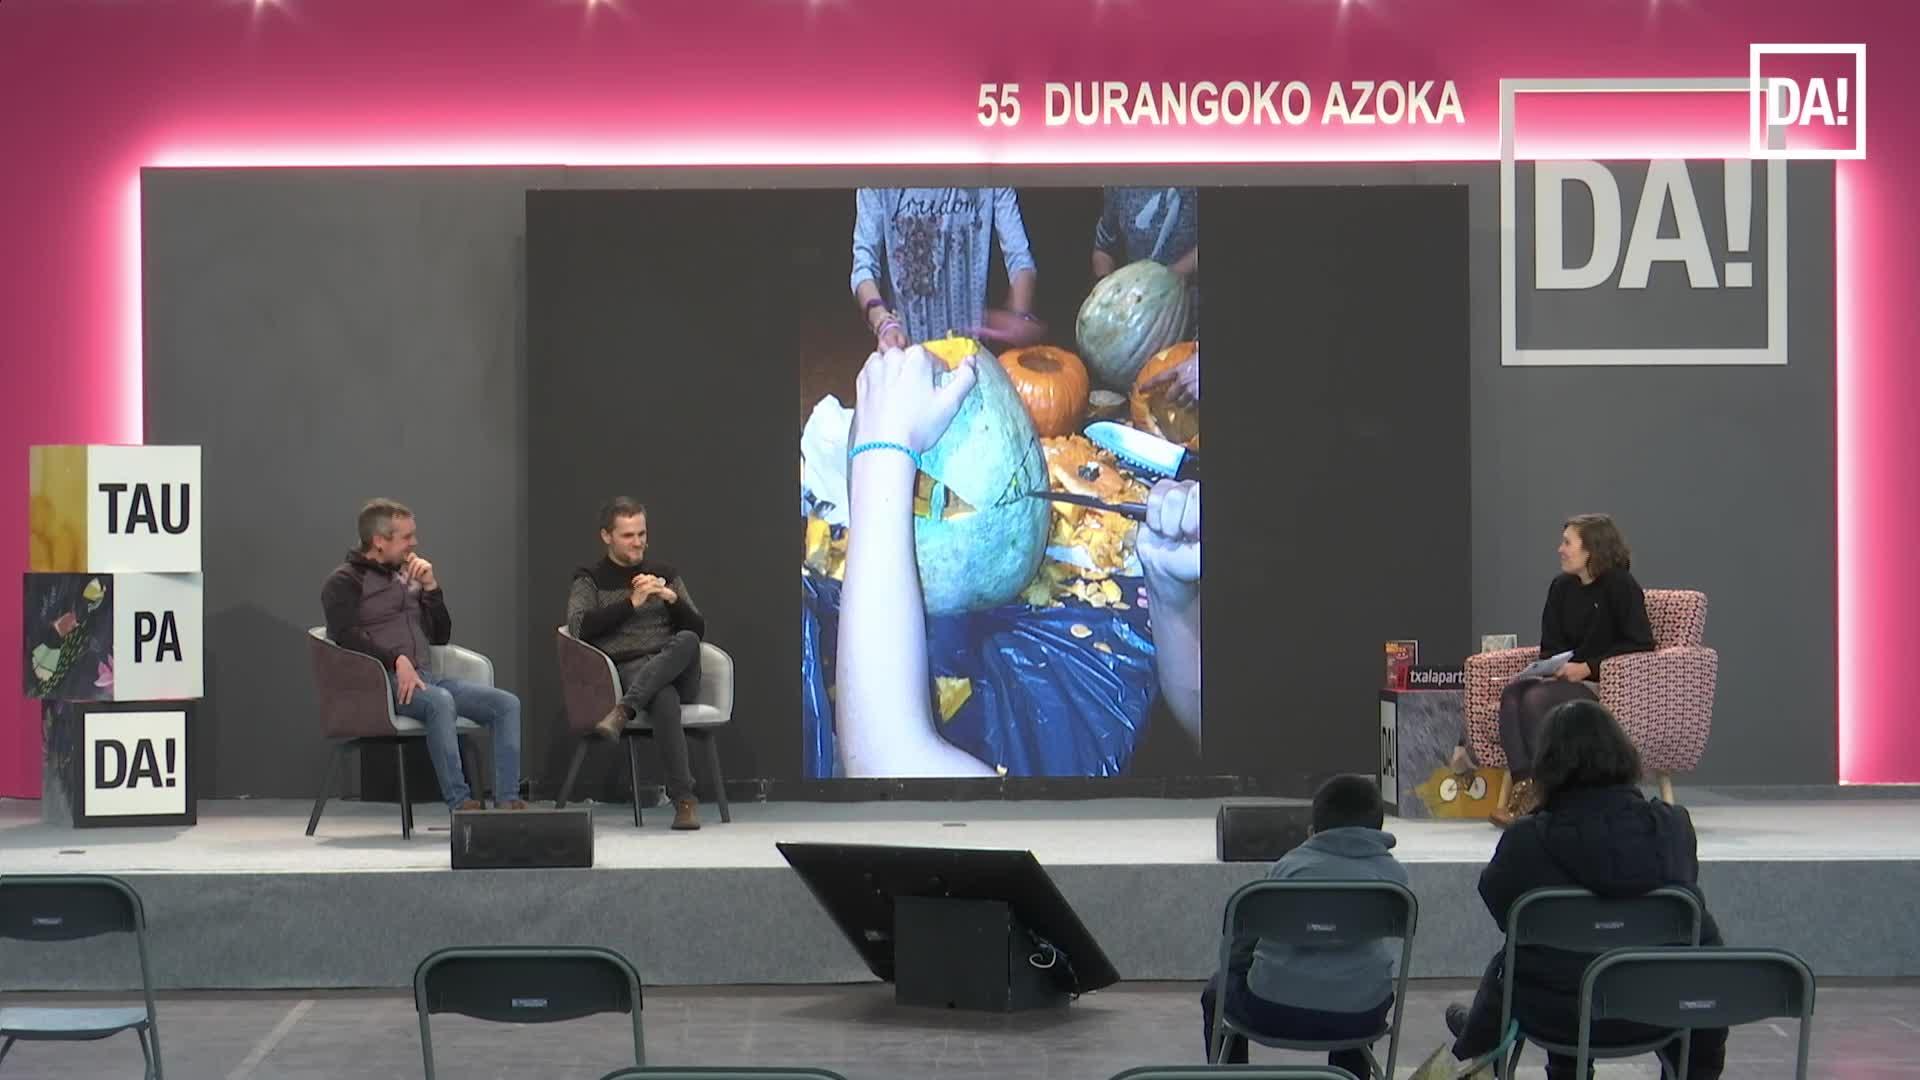 Josu Ozaita + Joseba Larratxe